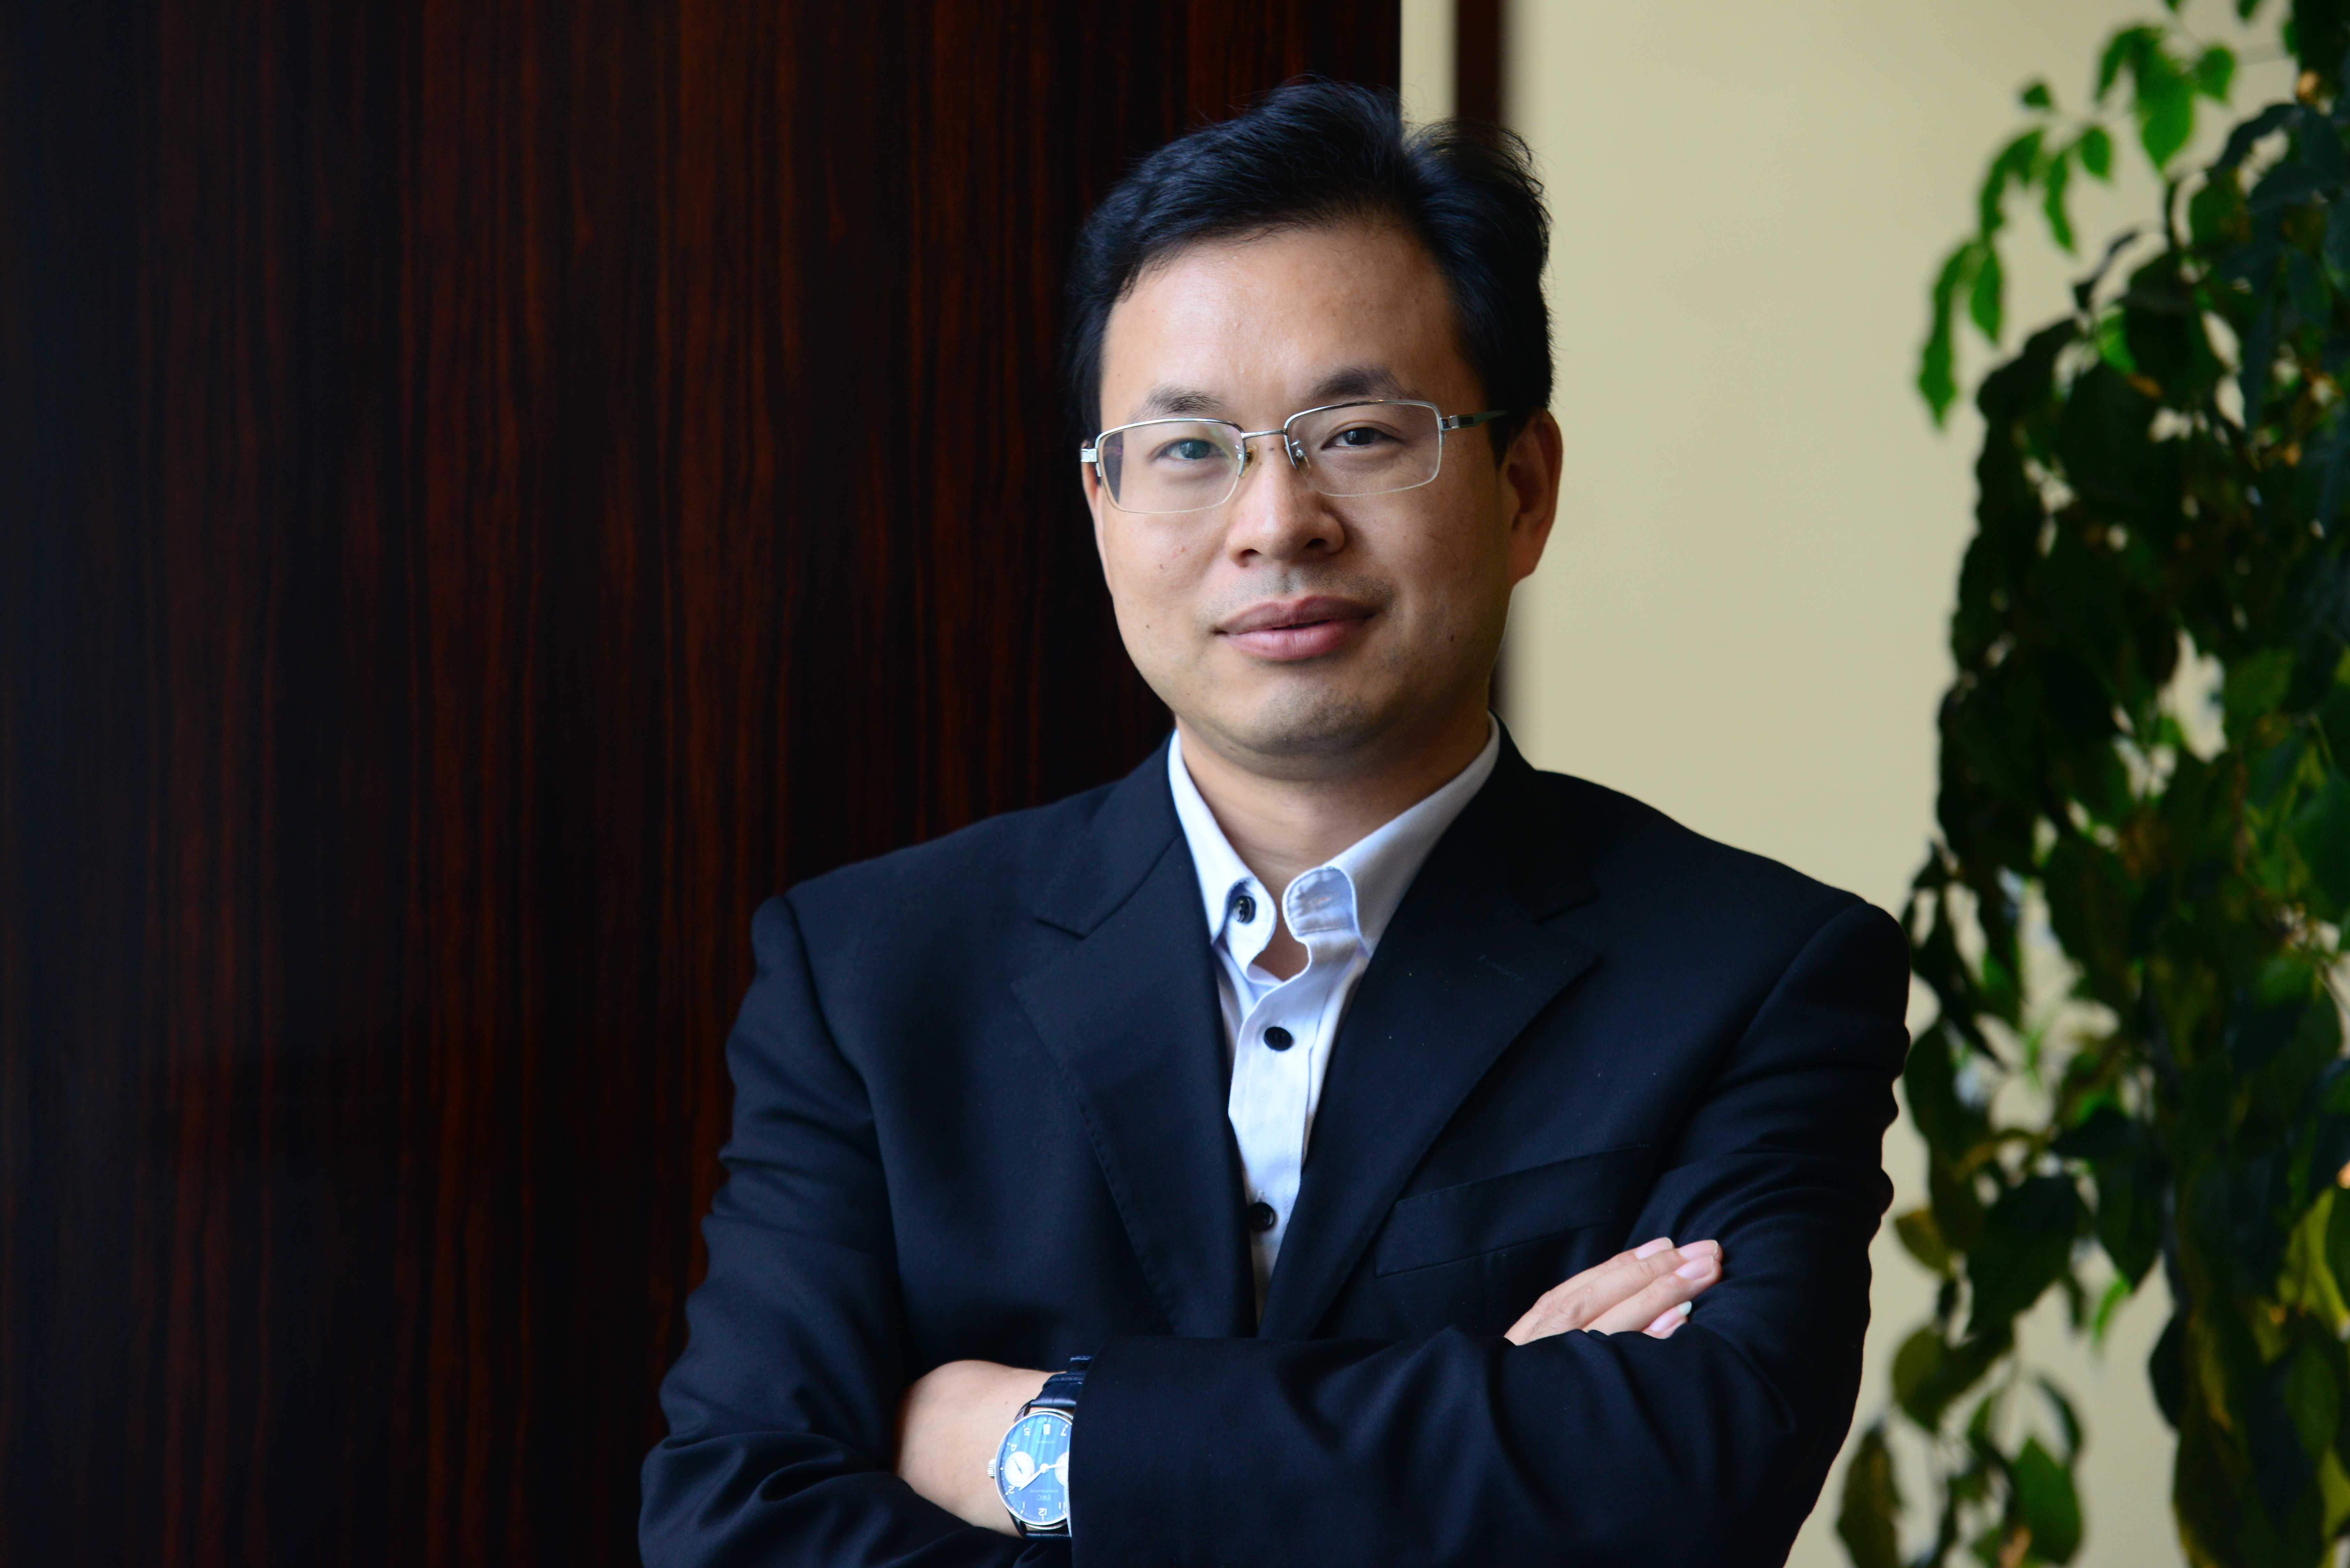 Rancher中国CEO 秦小康:Kubernetes为多云混合云而生